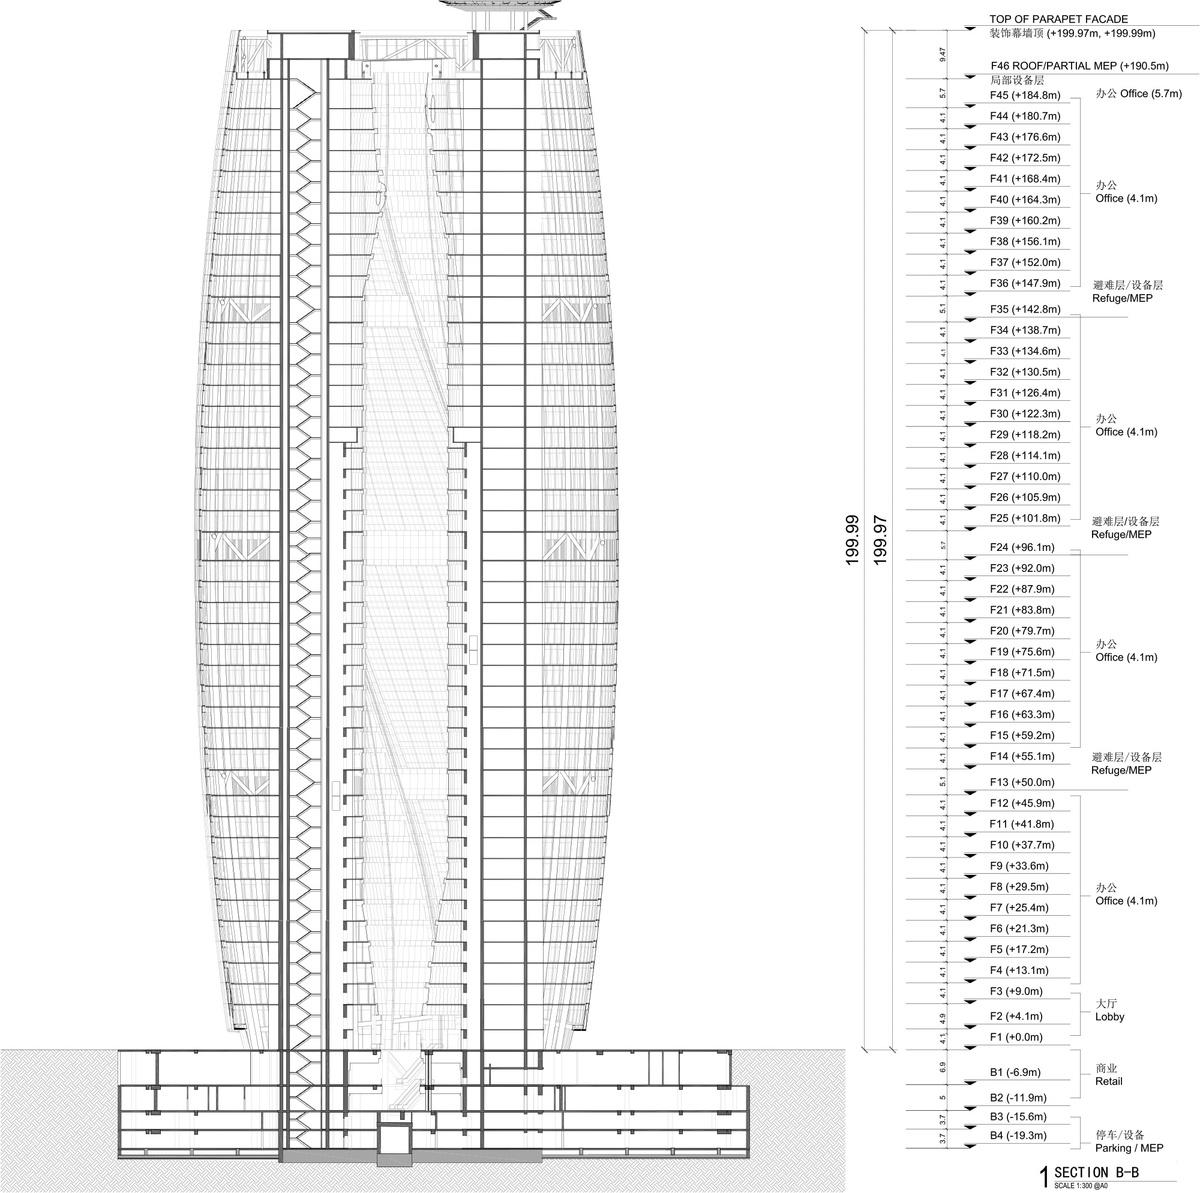 Leeza SOHO, Section AA through Atrium. Image courtesy of Zaha Hadid Architects.